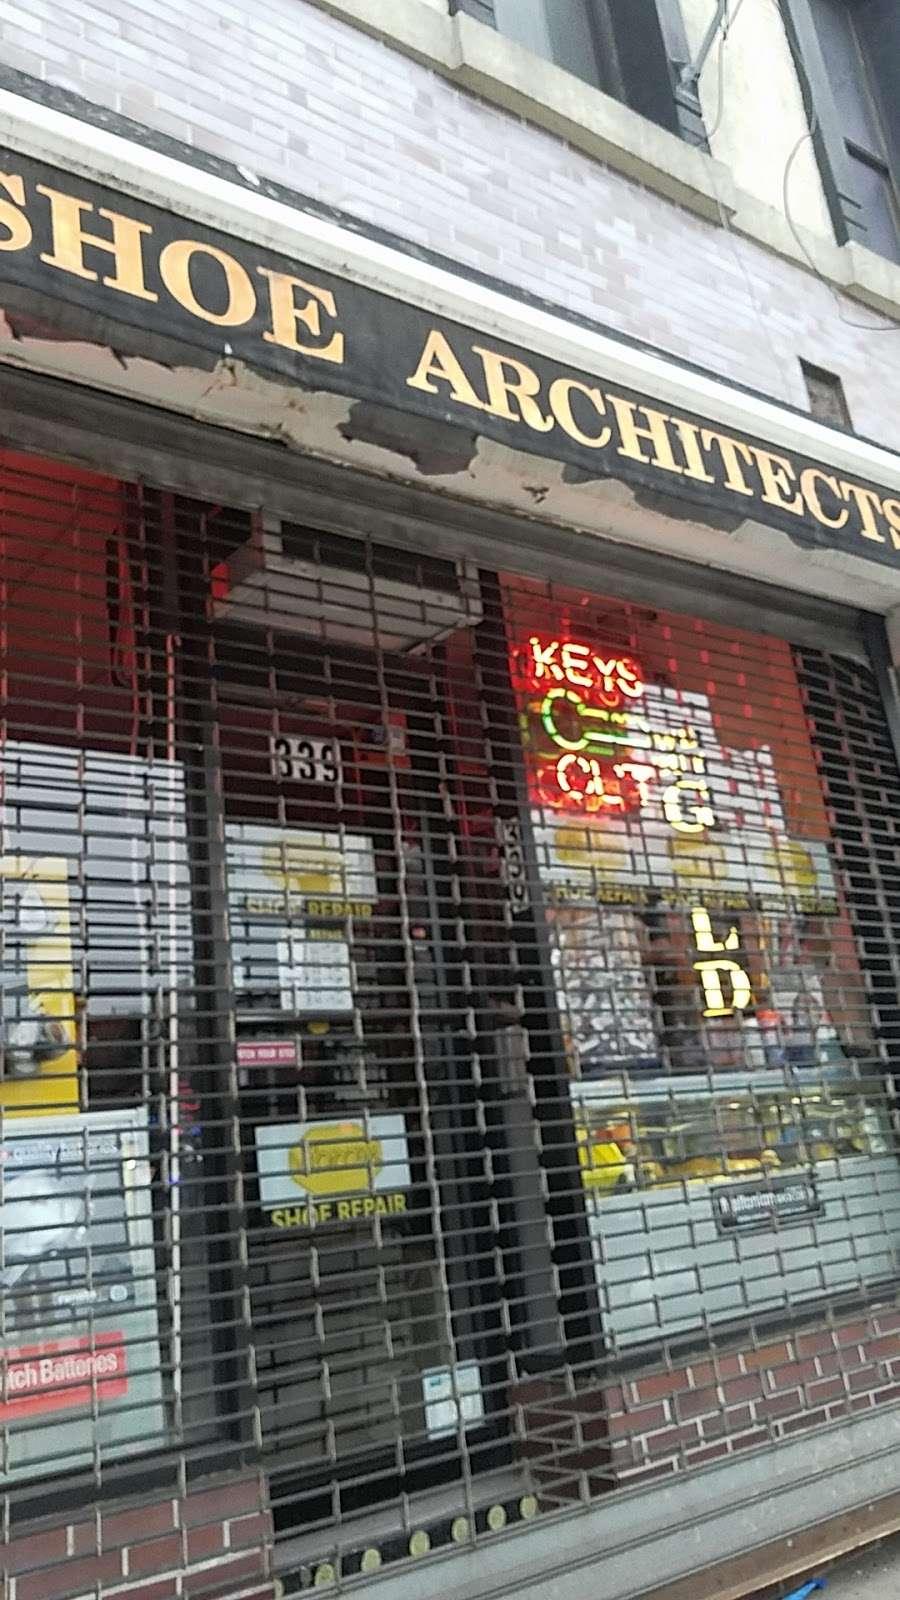 CrazyFixer - store    Photo 1 of 6   Address: 339 Flatbush Ave, Brooklyn, NY 11217, USA   Phone: (917) 309-3553